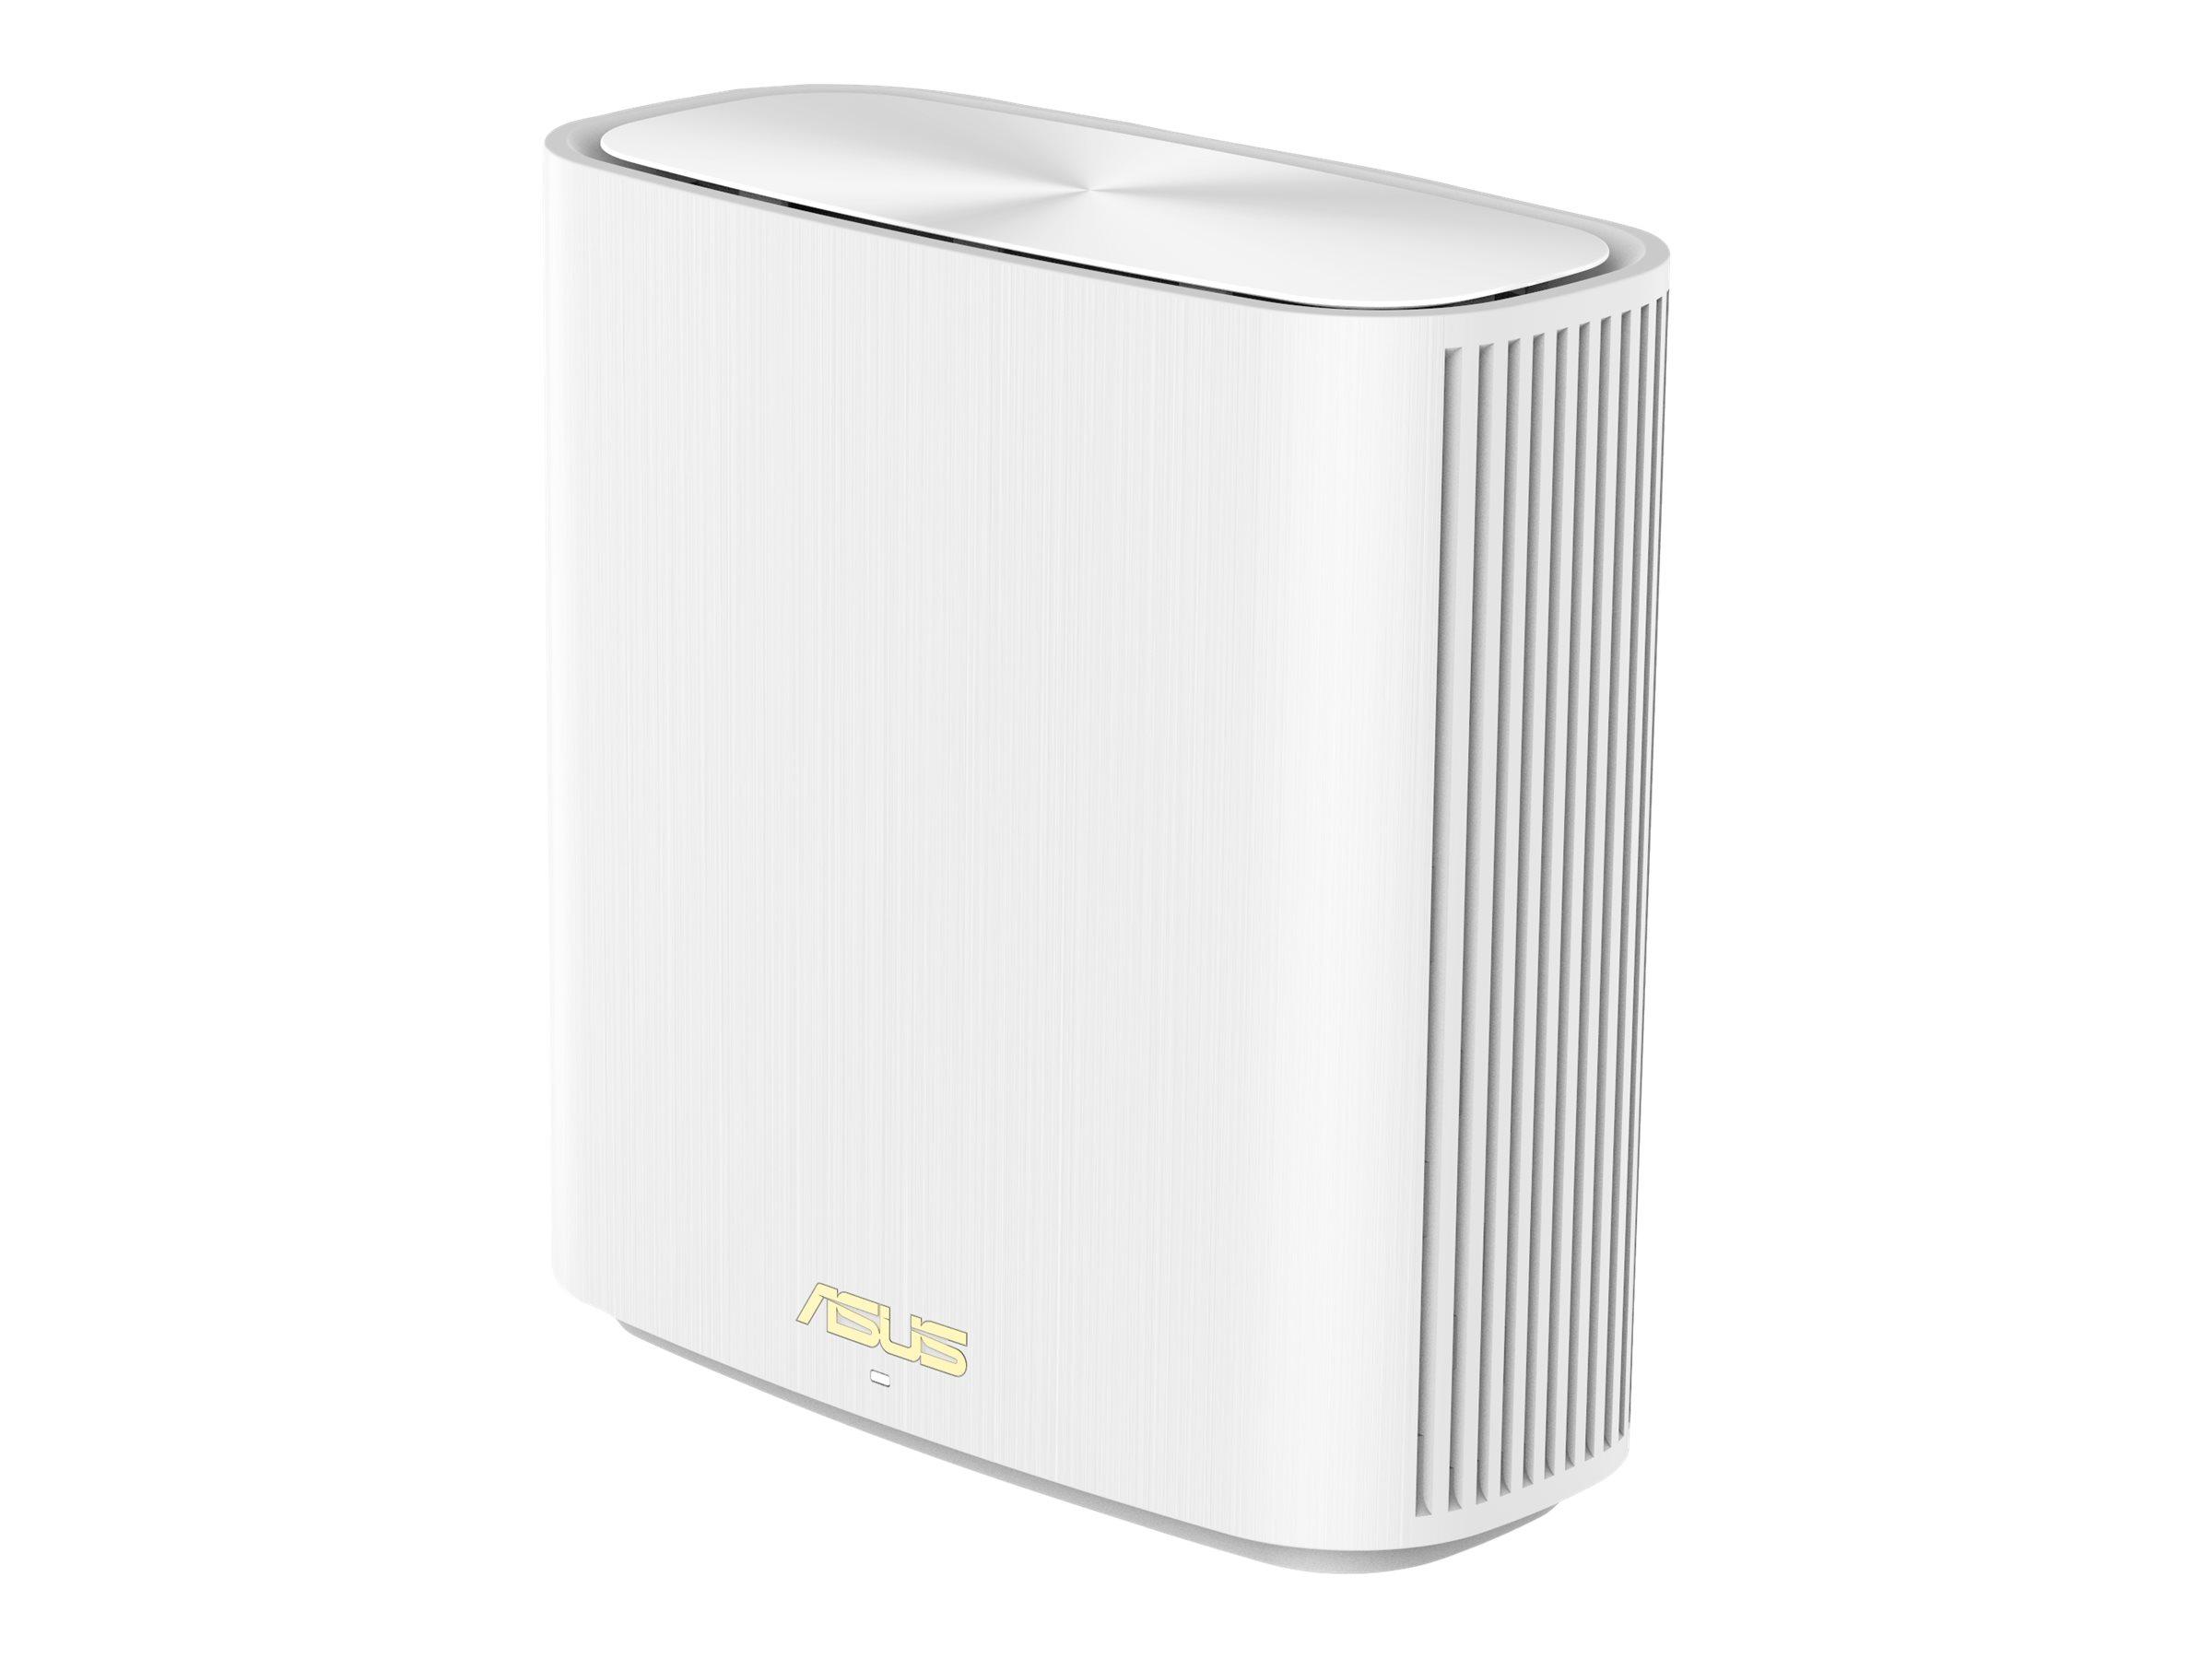 ASUS ZenWiFi XD6 - Wireless Router - 3-Port-Switch